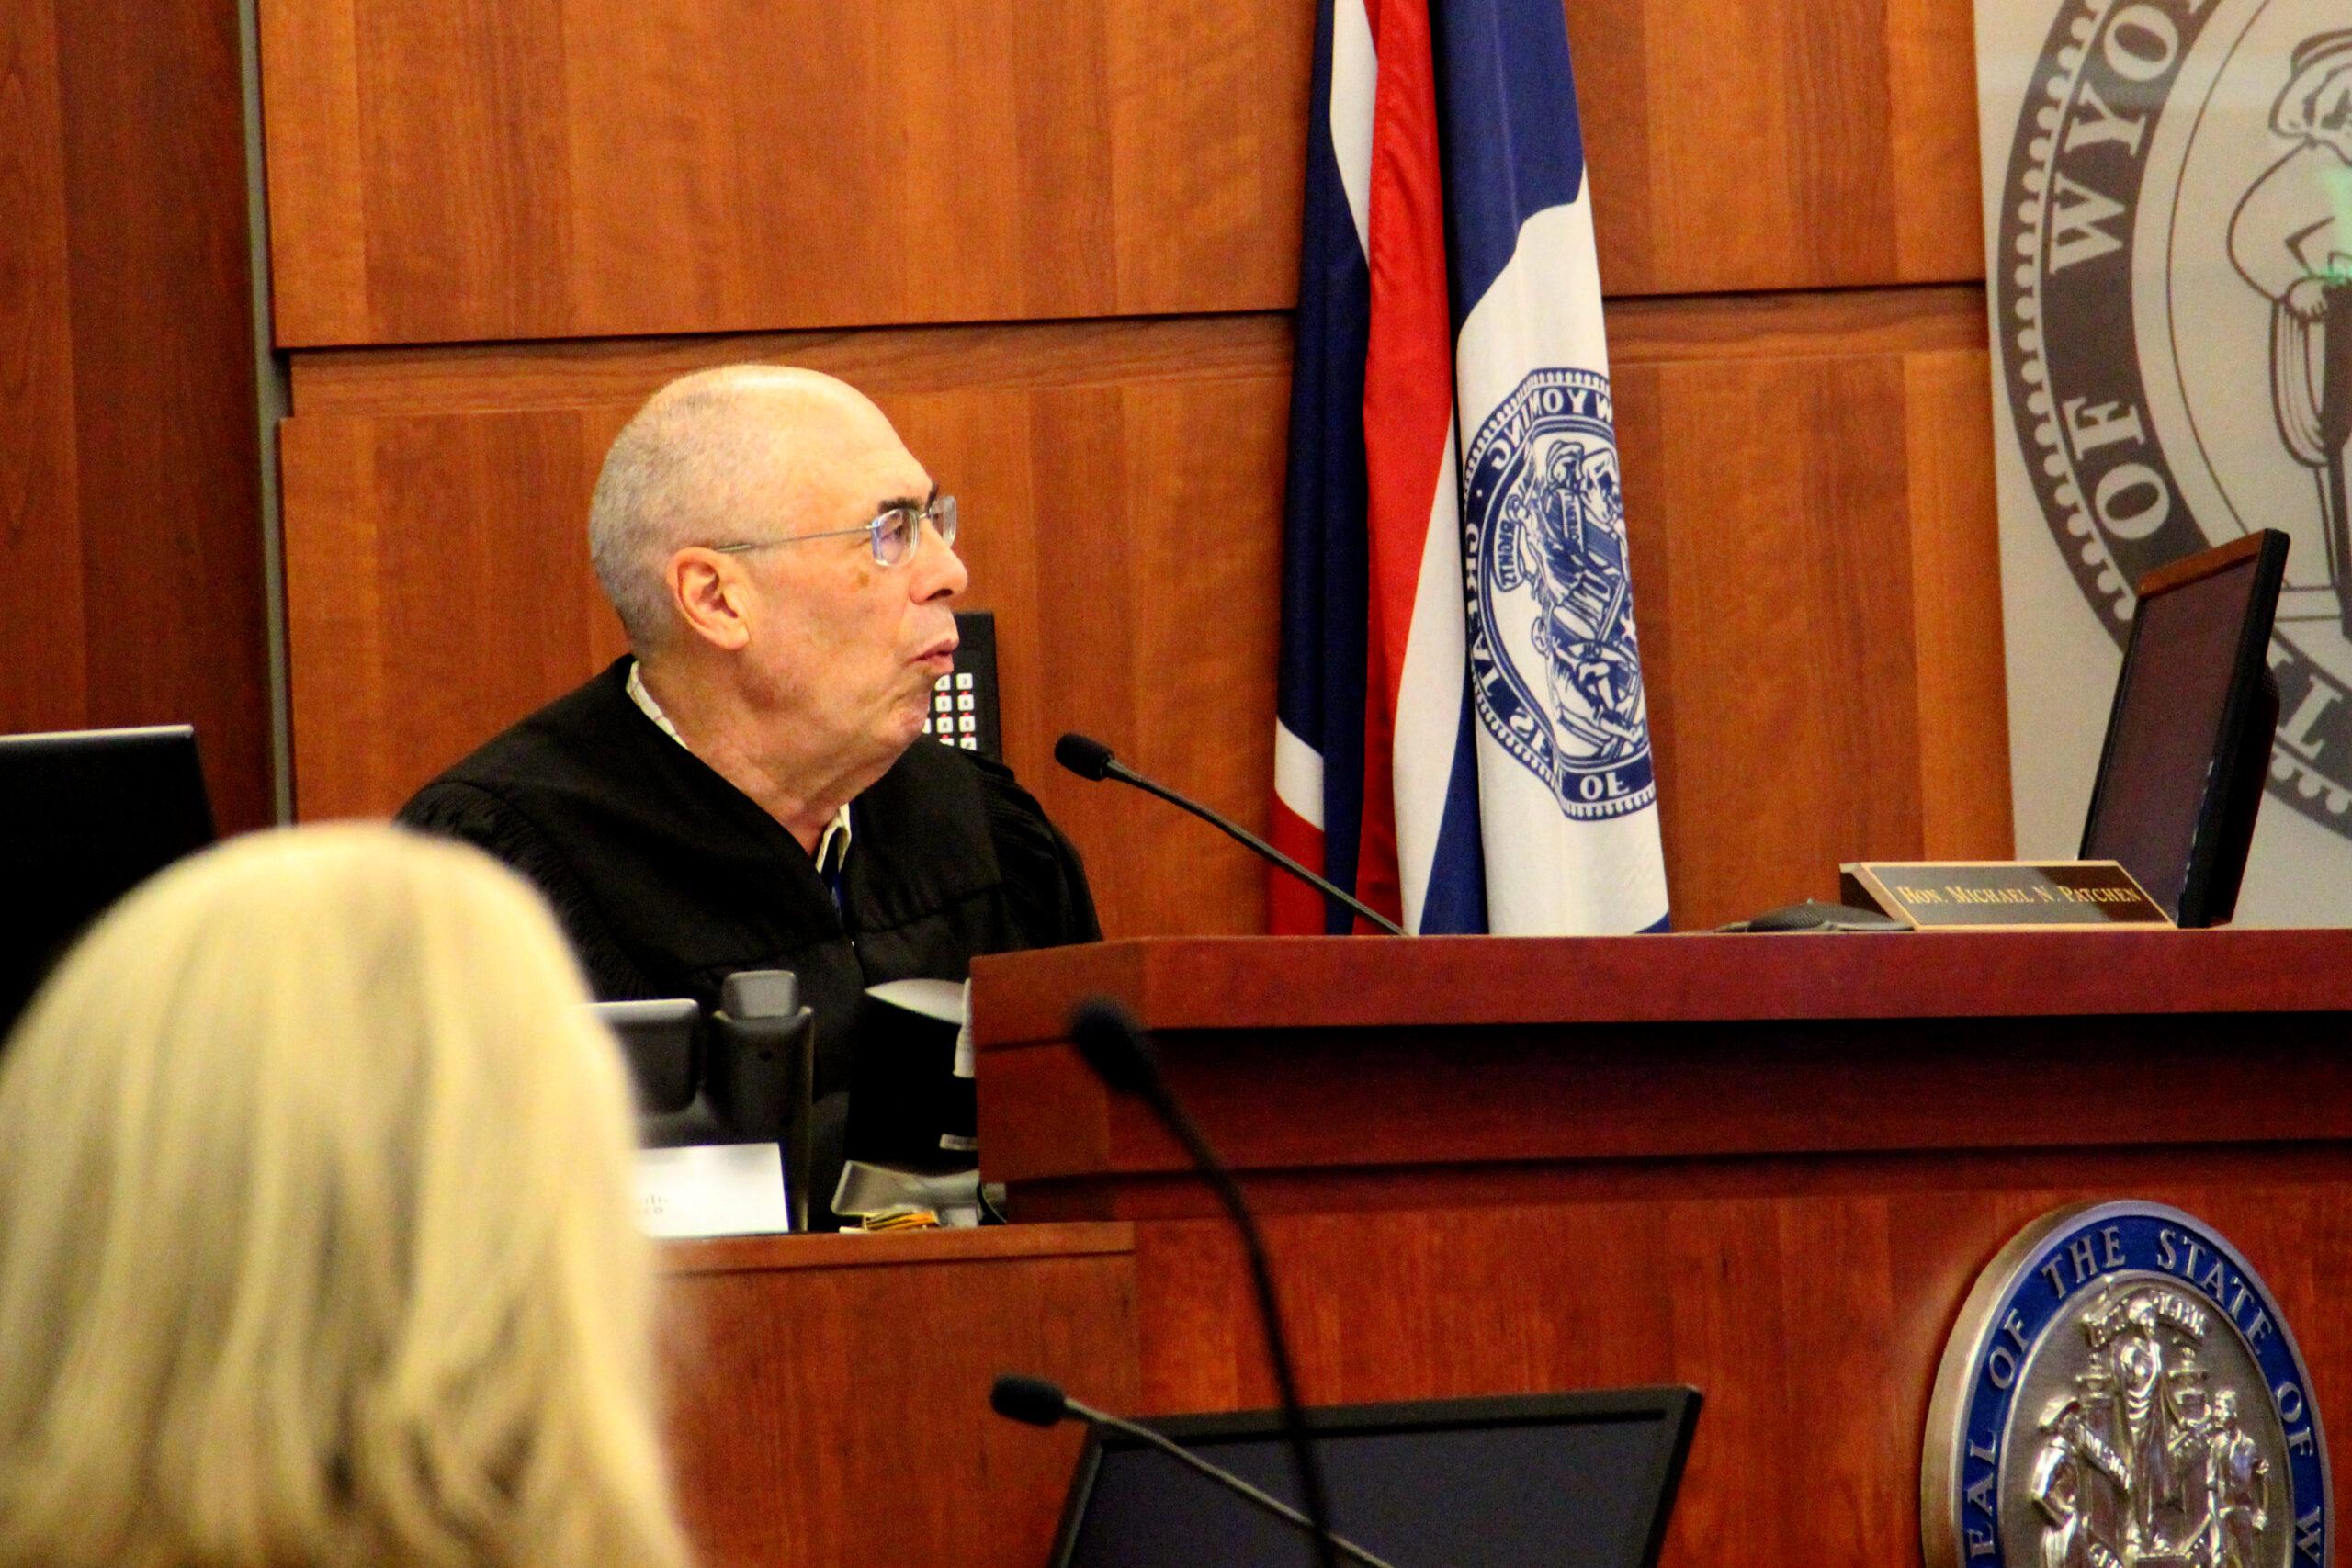 Cash-only bond set in misdemeanor case, judge cites threats made against victim - Oil City News